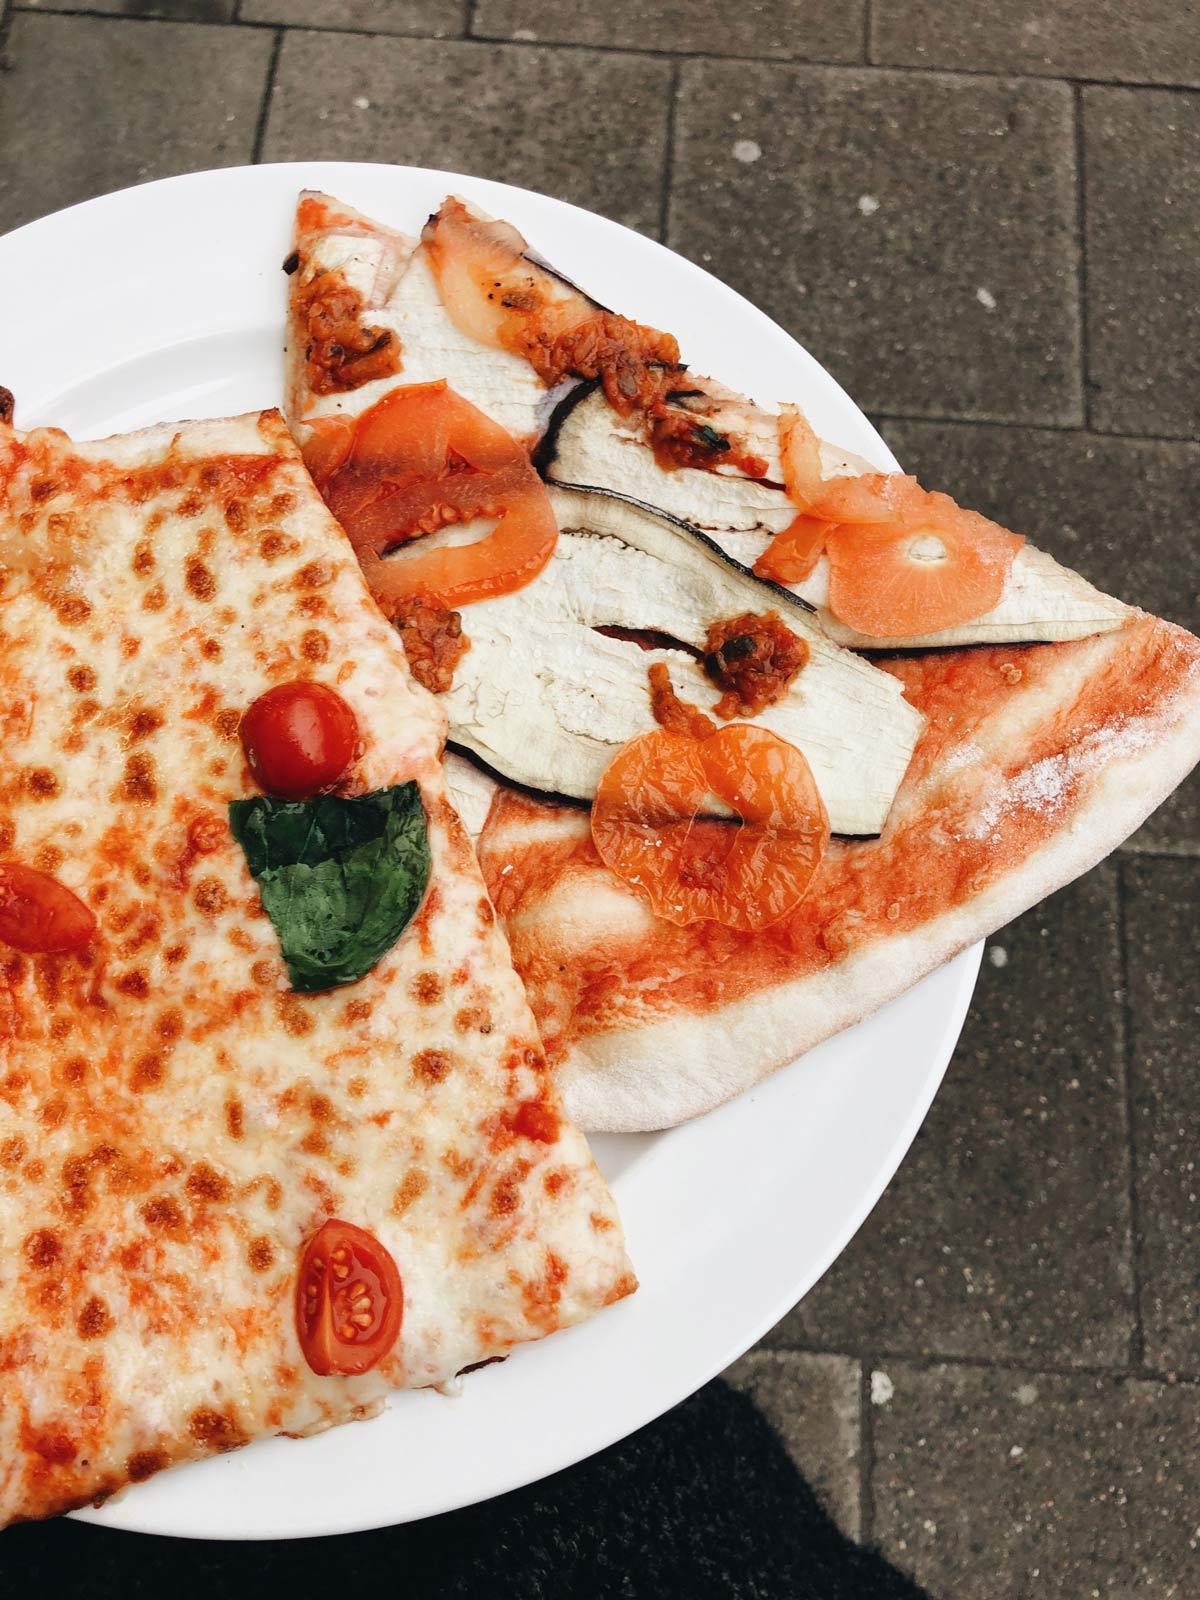 müllfreies Pizza Takeaway mit eigenem Teller